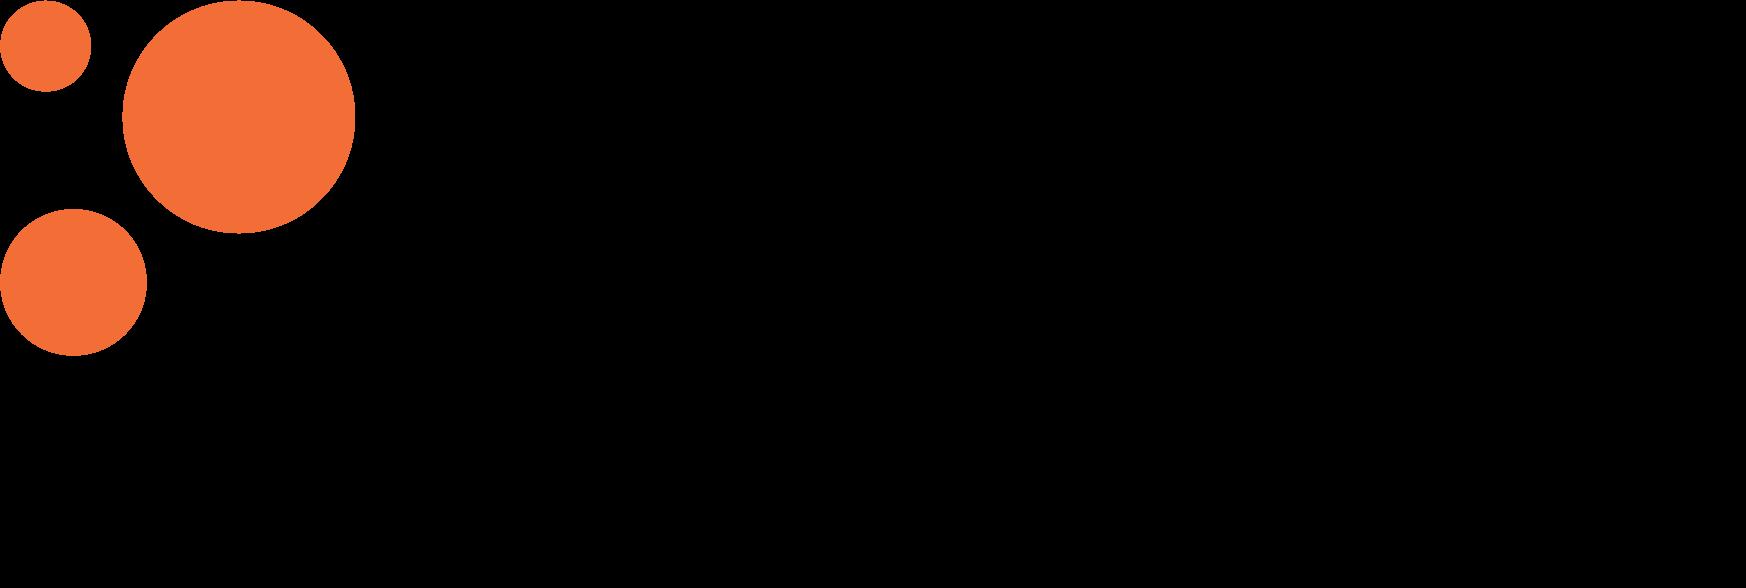 Blind Low Vision NZ (Formerly Blind Foundation) logo